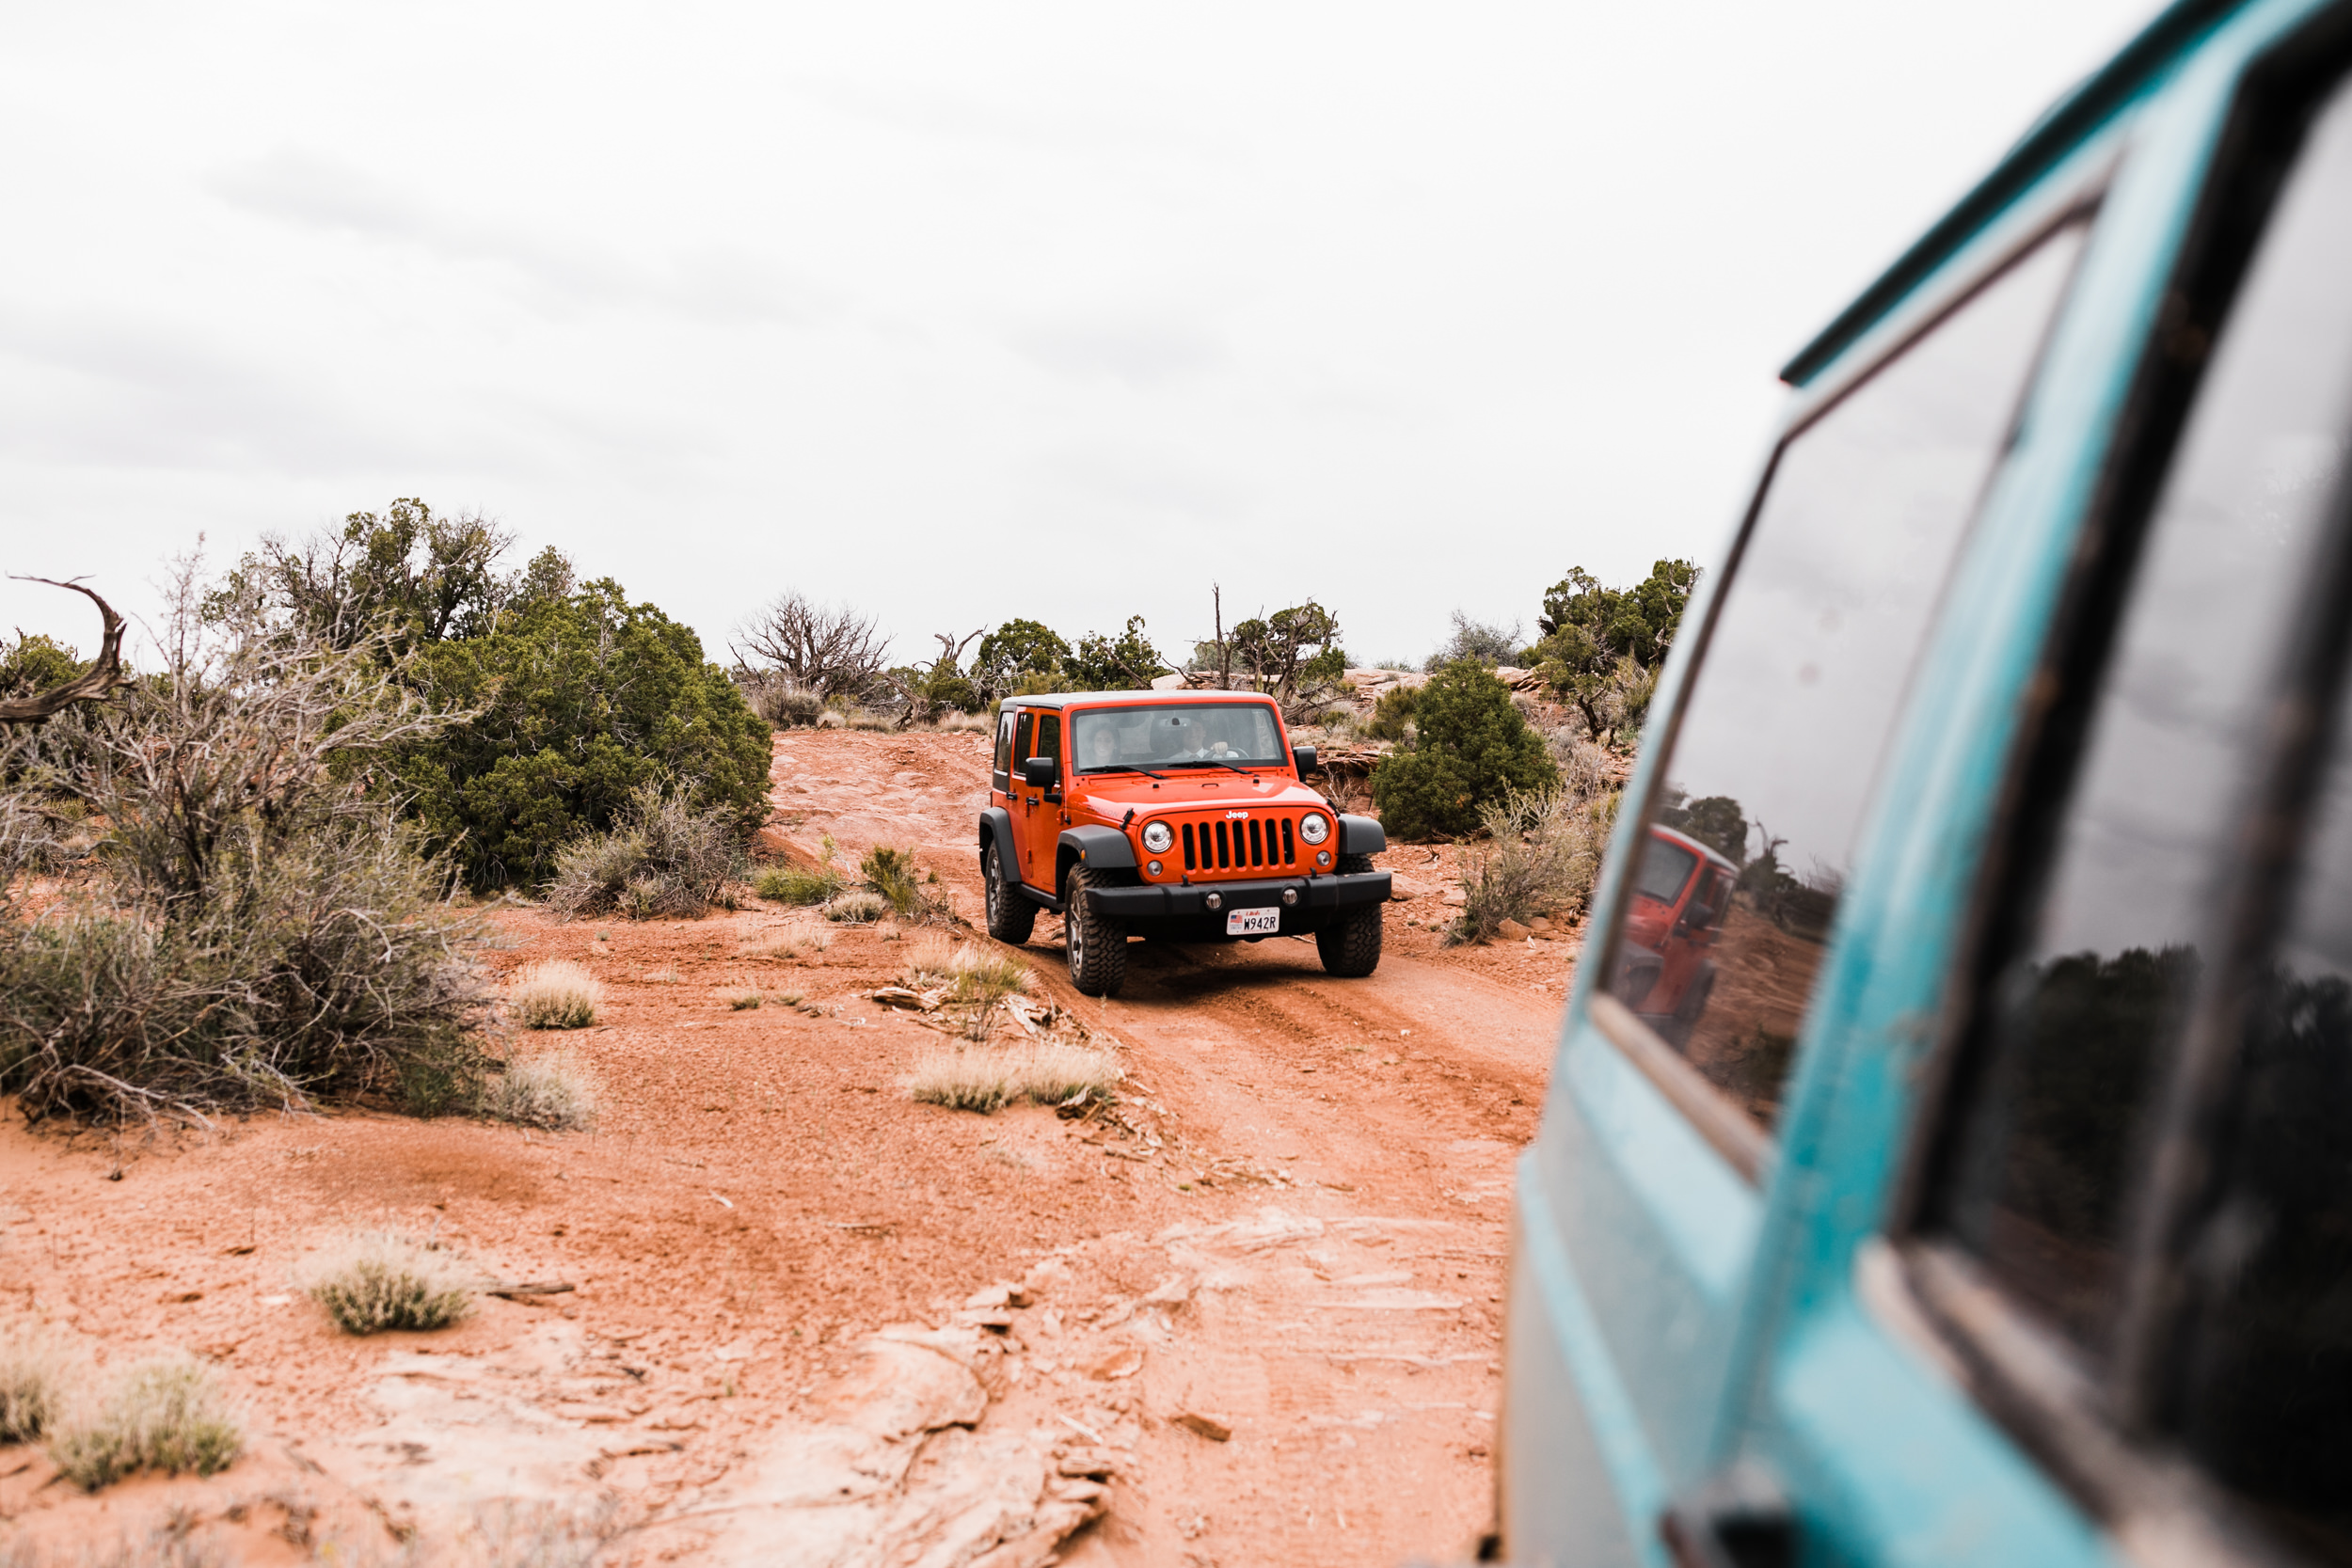 Jeep-Wedding-Moab-Utah-Hearnes-Adventure-Elopement-Photography-4.jpg